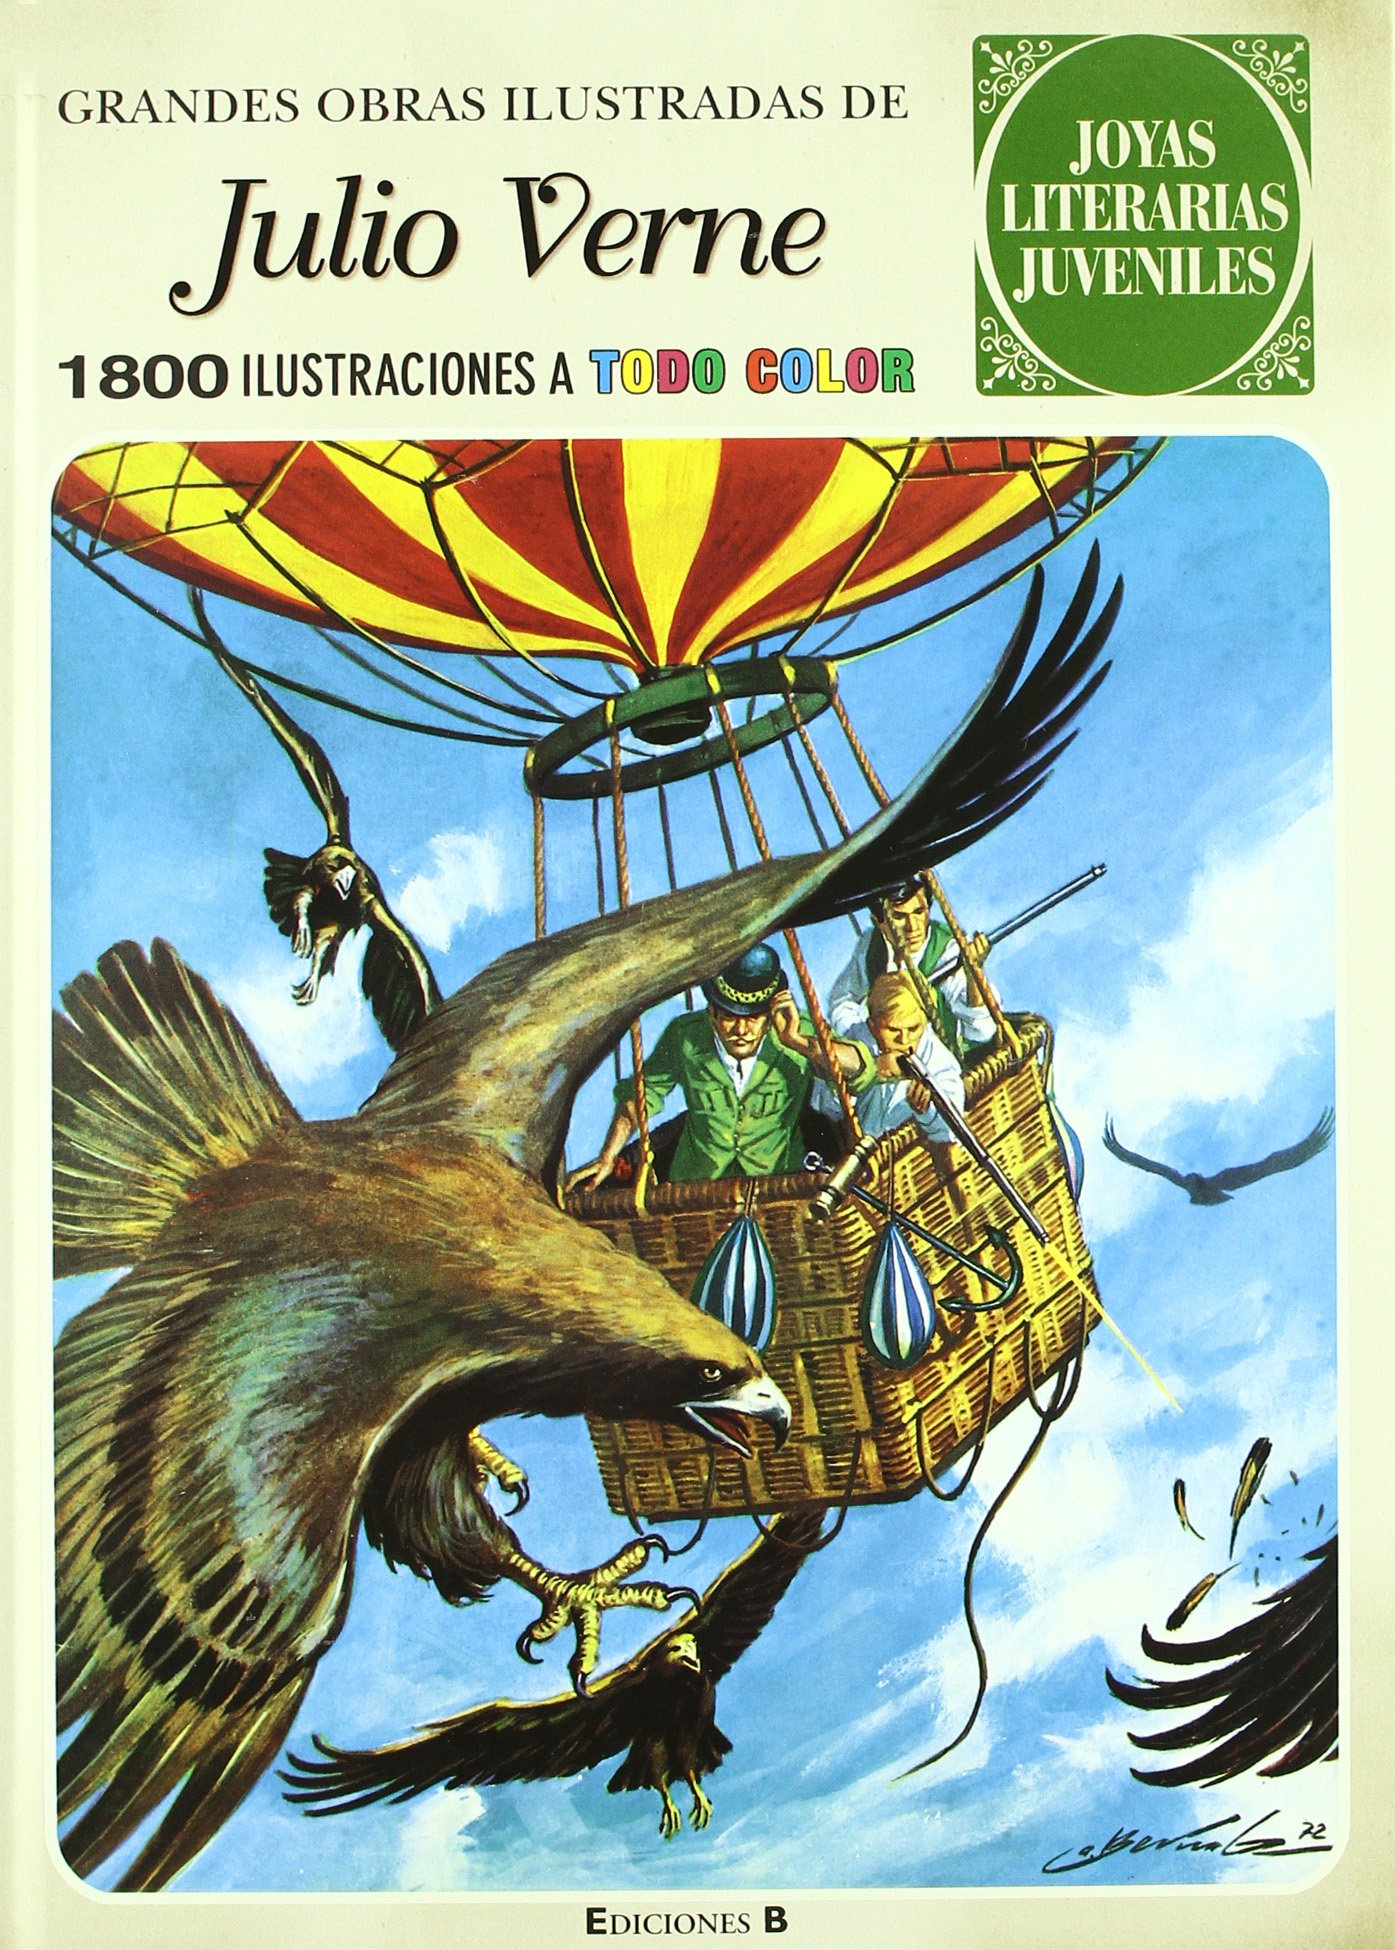 Joyas Literarias Nº 4 (Julio Verne 2) (Spanish Edition): Julio Verne: 9788466640916: Amazon.com: Books